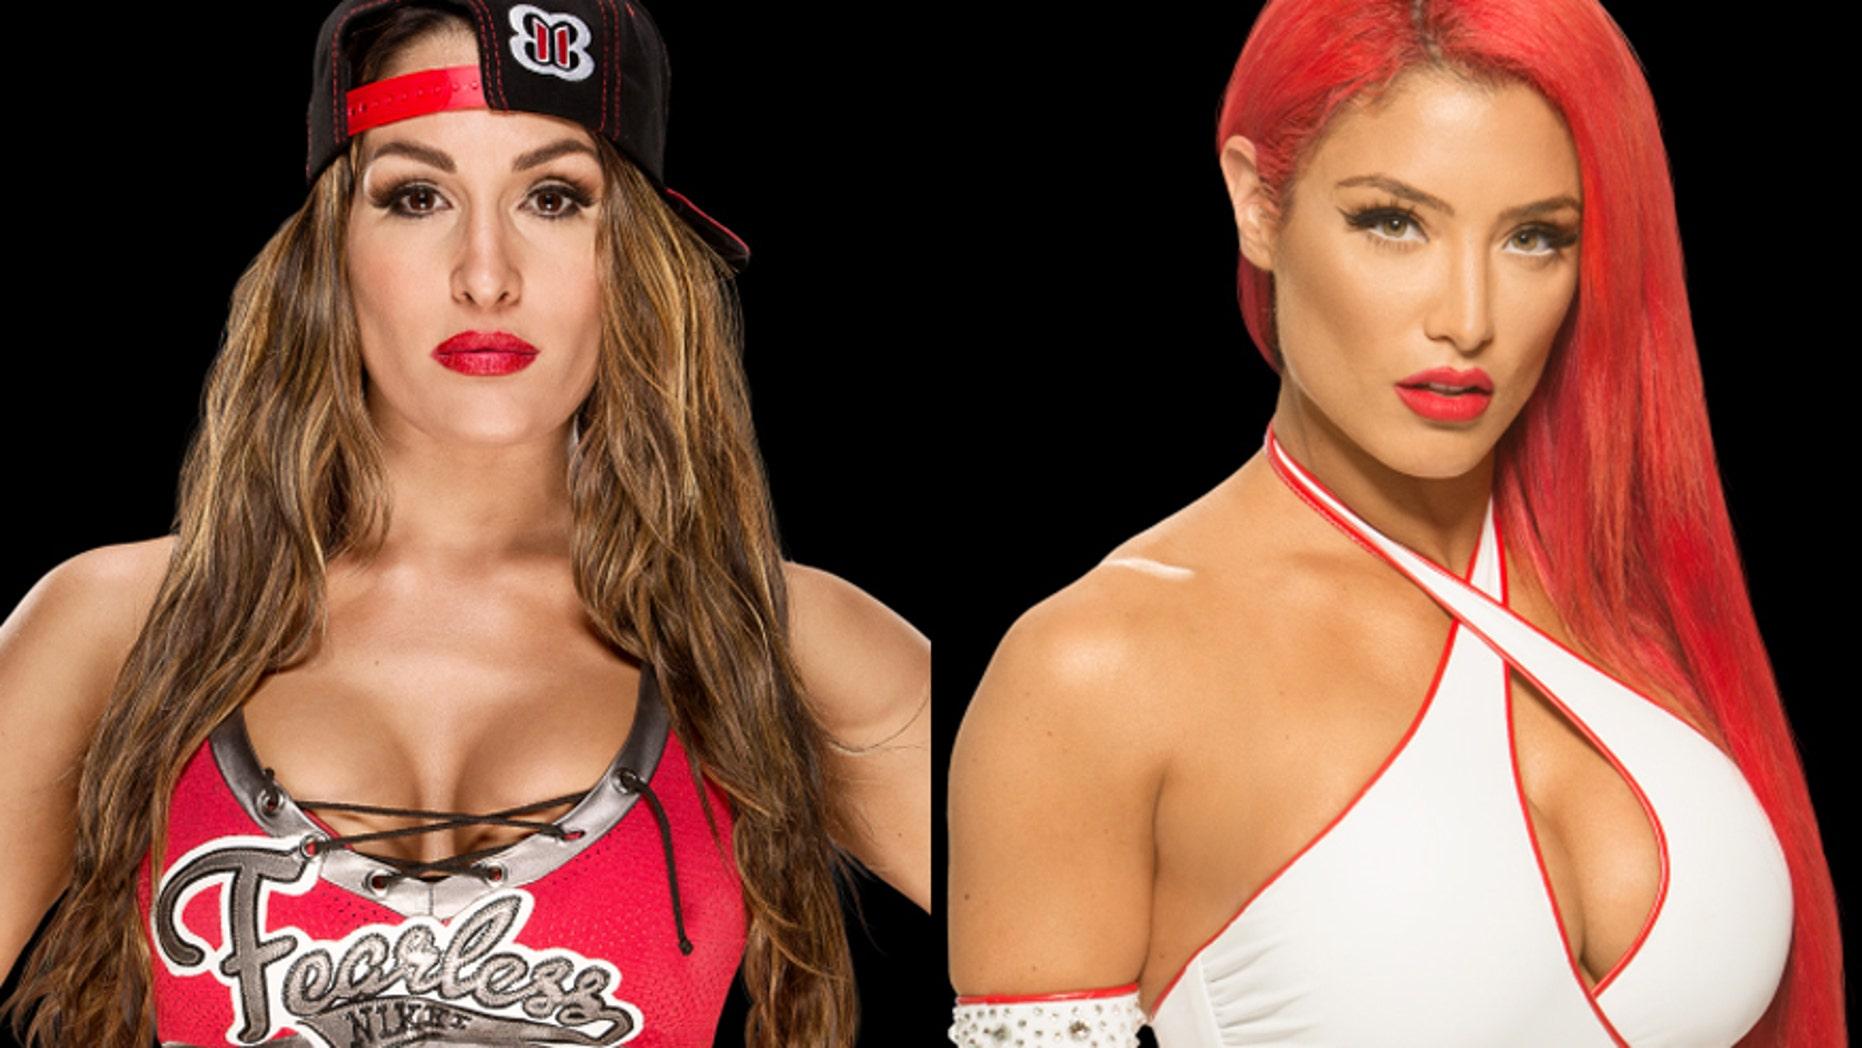 WWE wrestlers Nikki Bella (left) and Eva Marie.